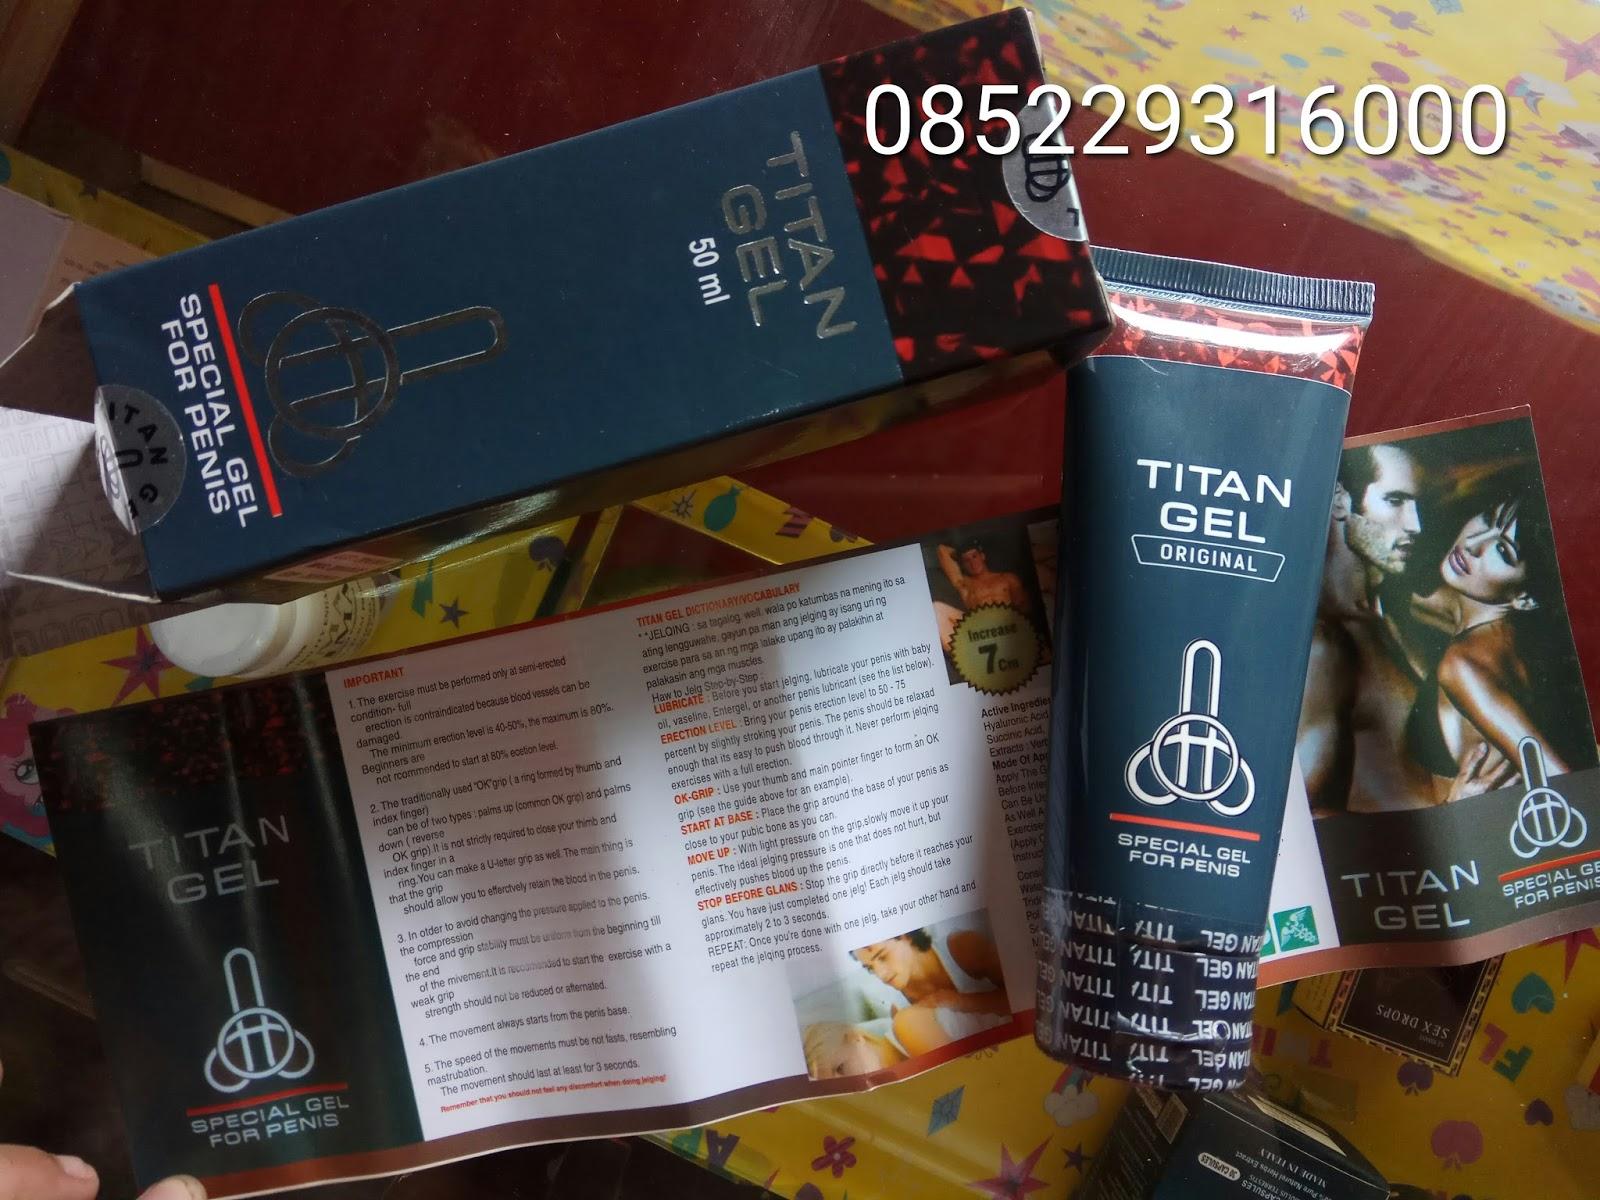 jual titan gel asli di bandung buktikan produk asli harga termurah